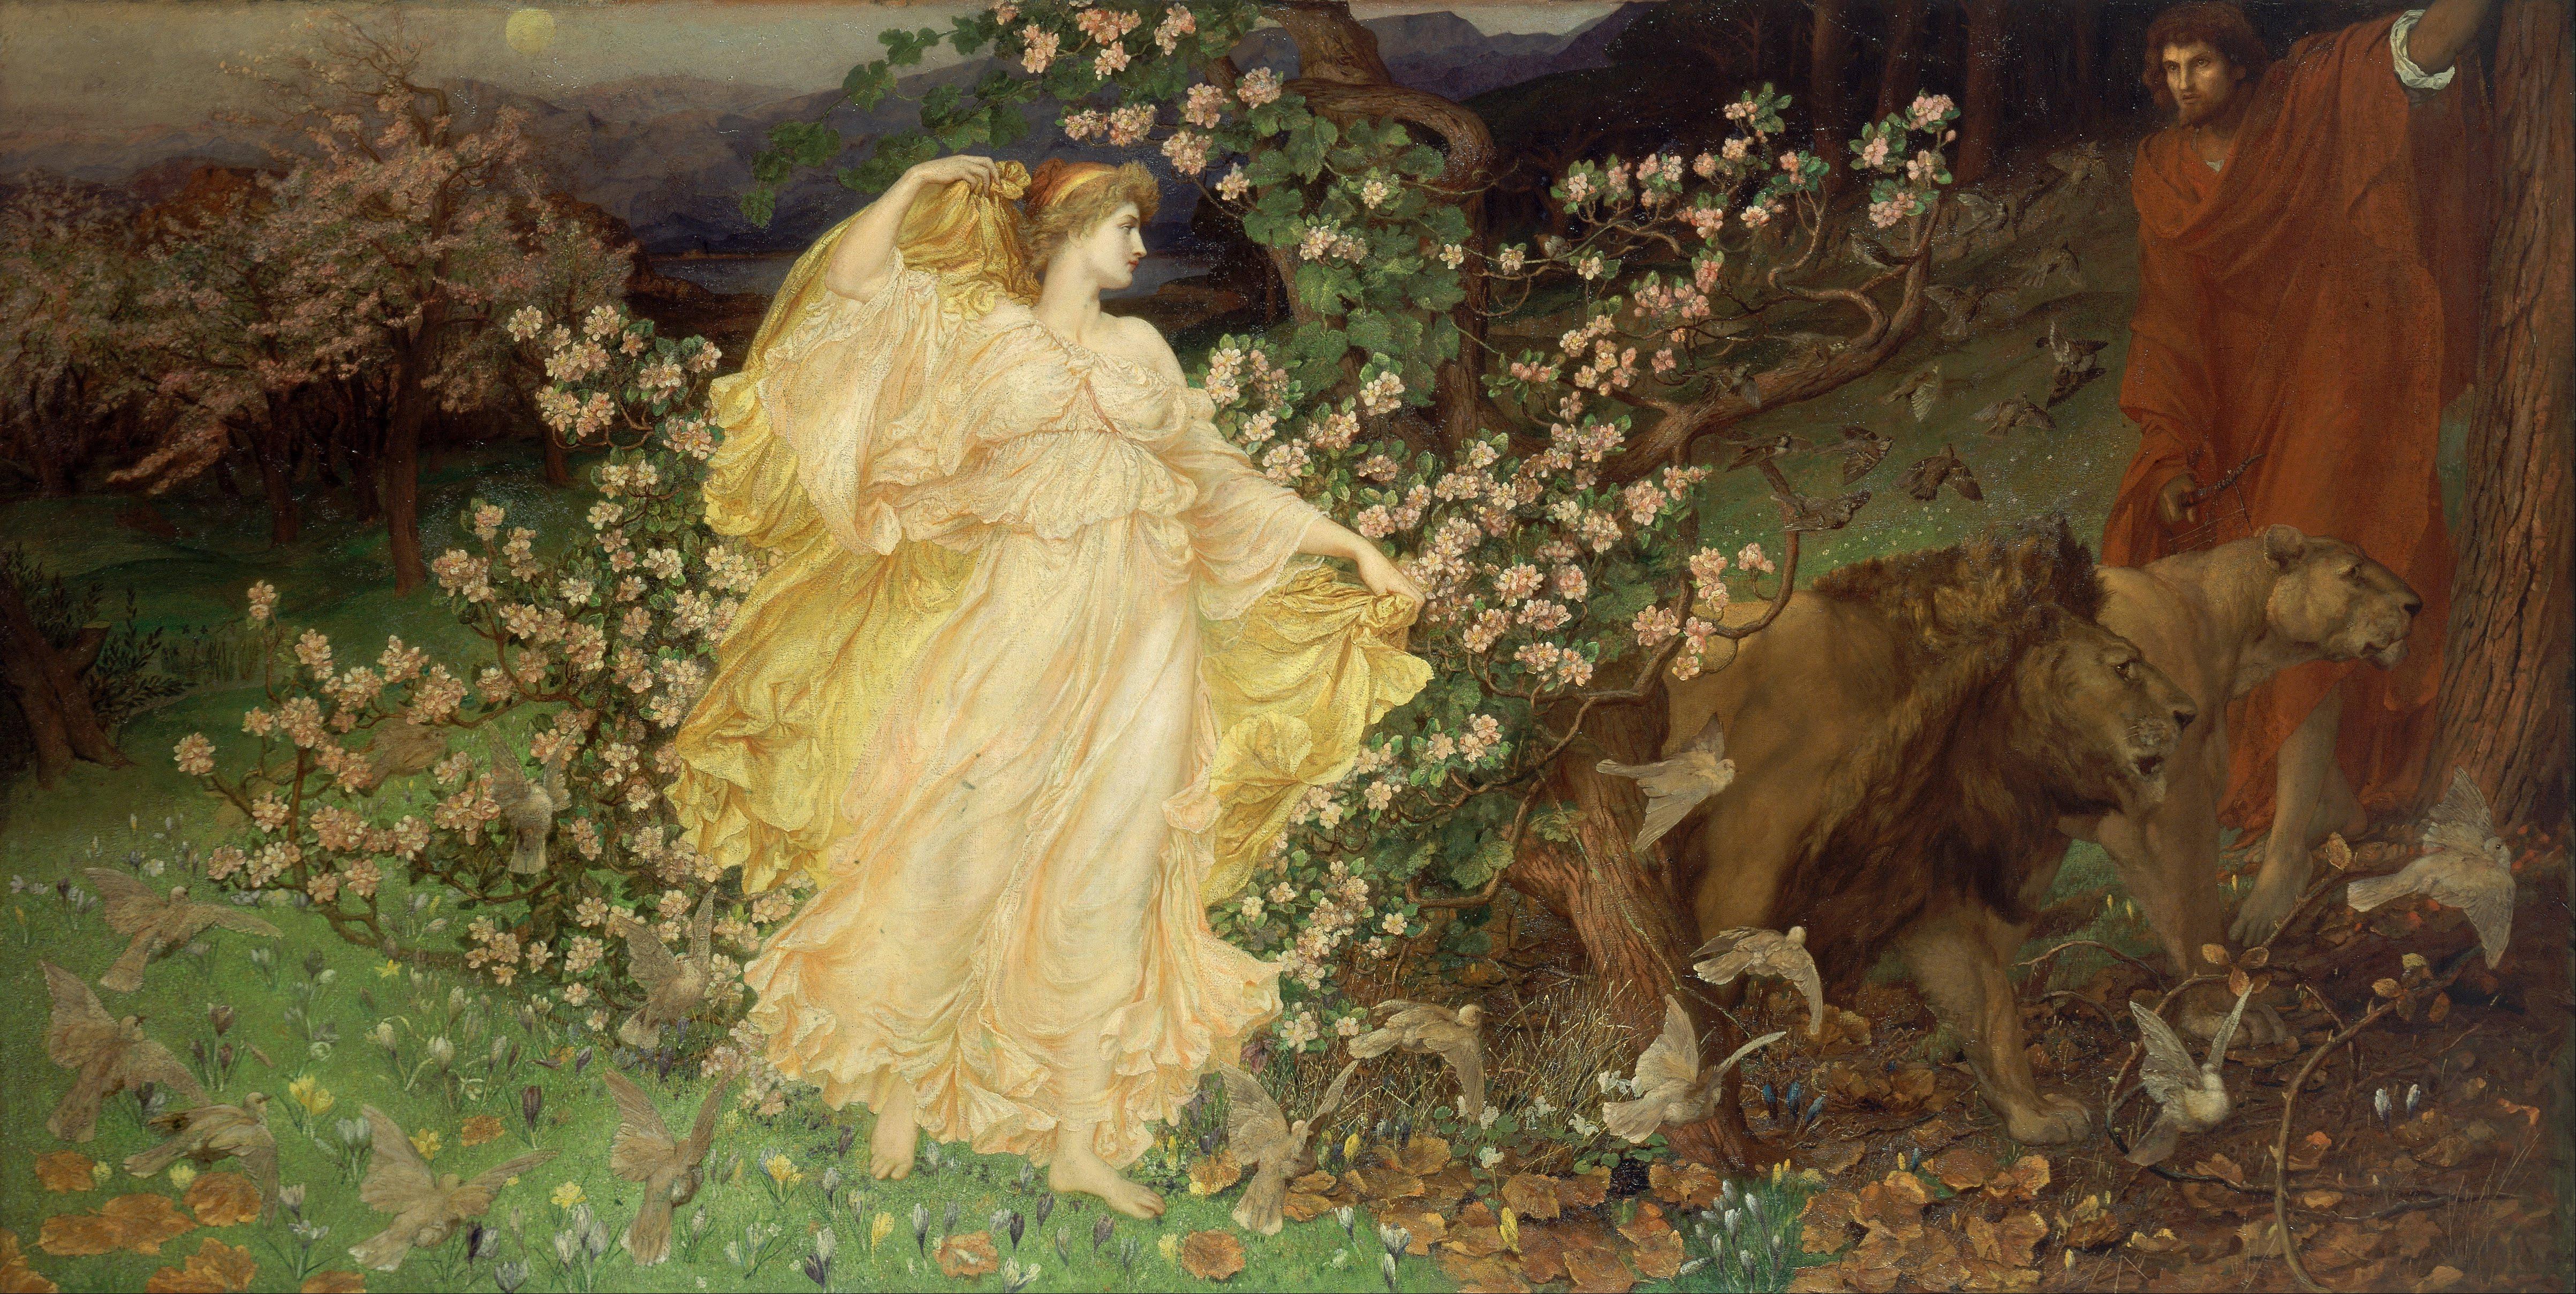 Venus and Anchises (William Blake Richmond, 1889/1890, oil on canvas)